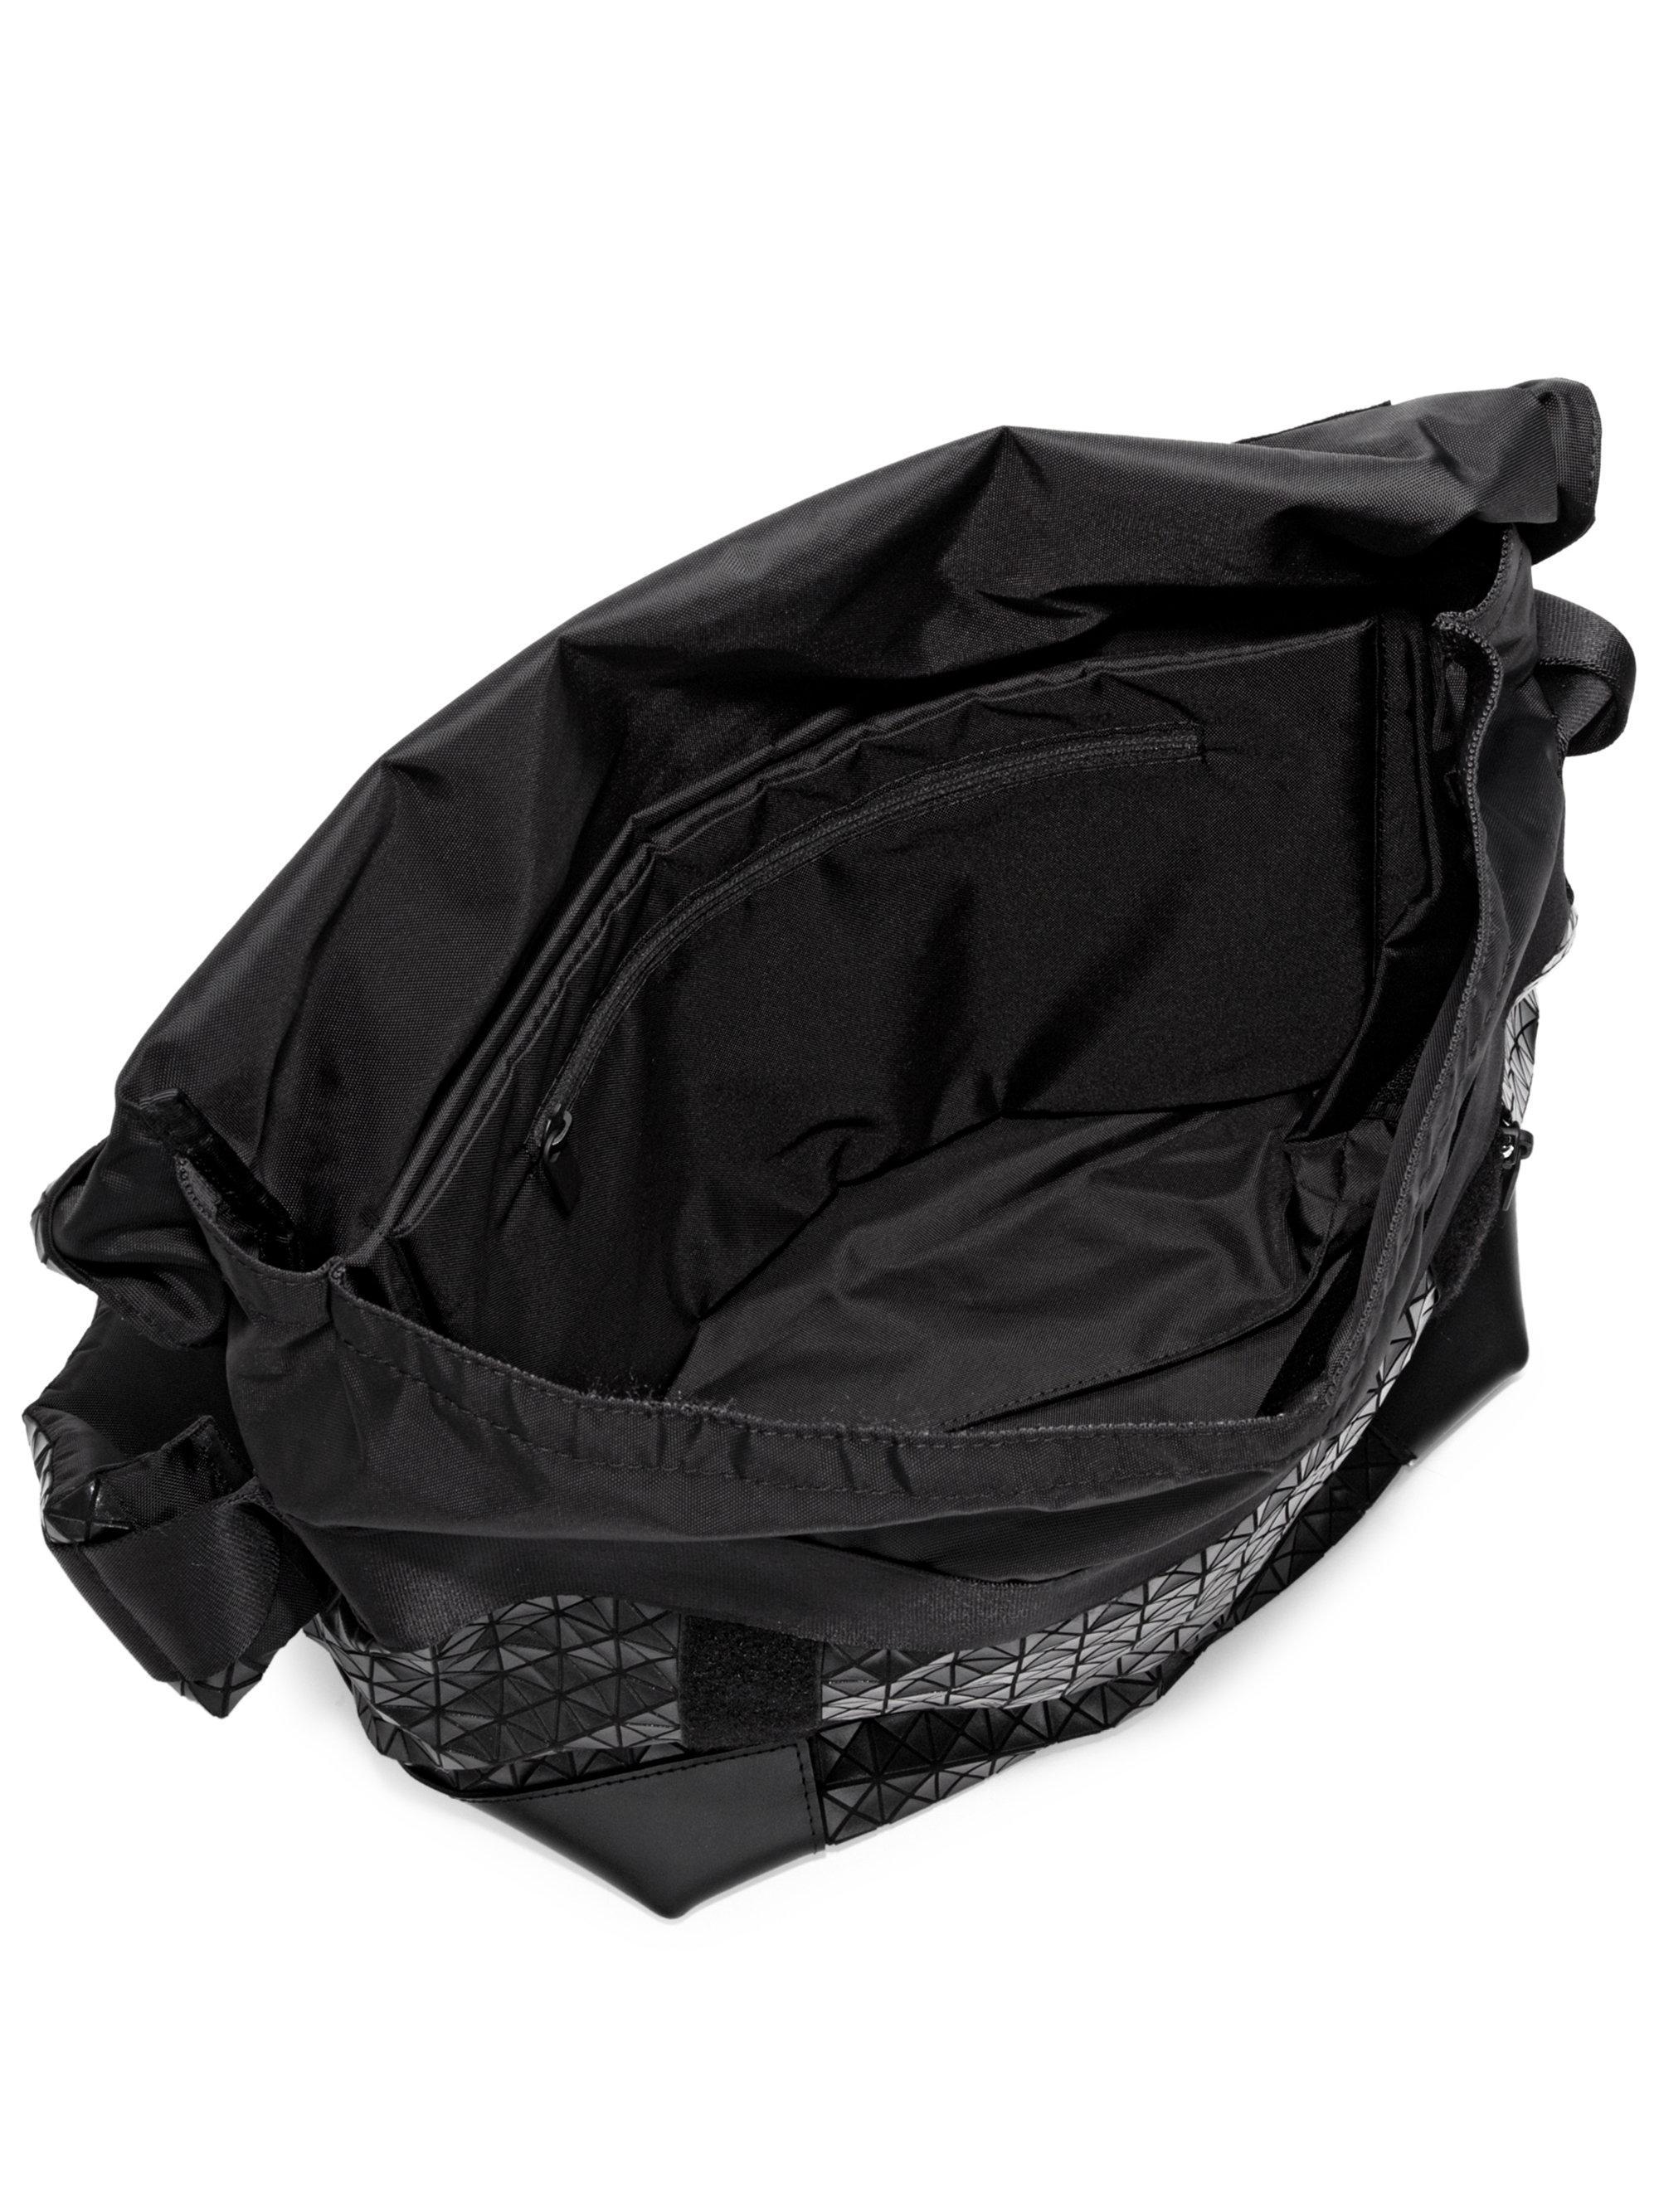 808c9f3fc8cc Bao Bao Issey Miyake Geometric Paneled Rider Messenger Bag in Black ...